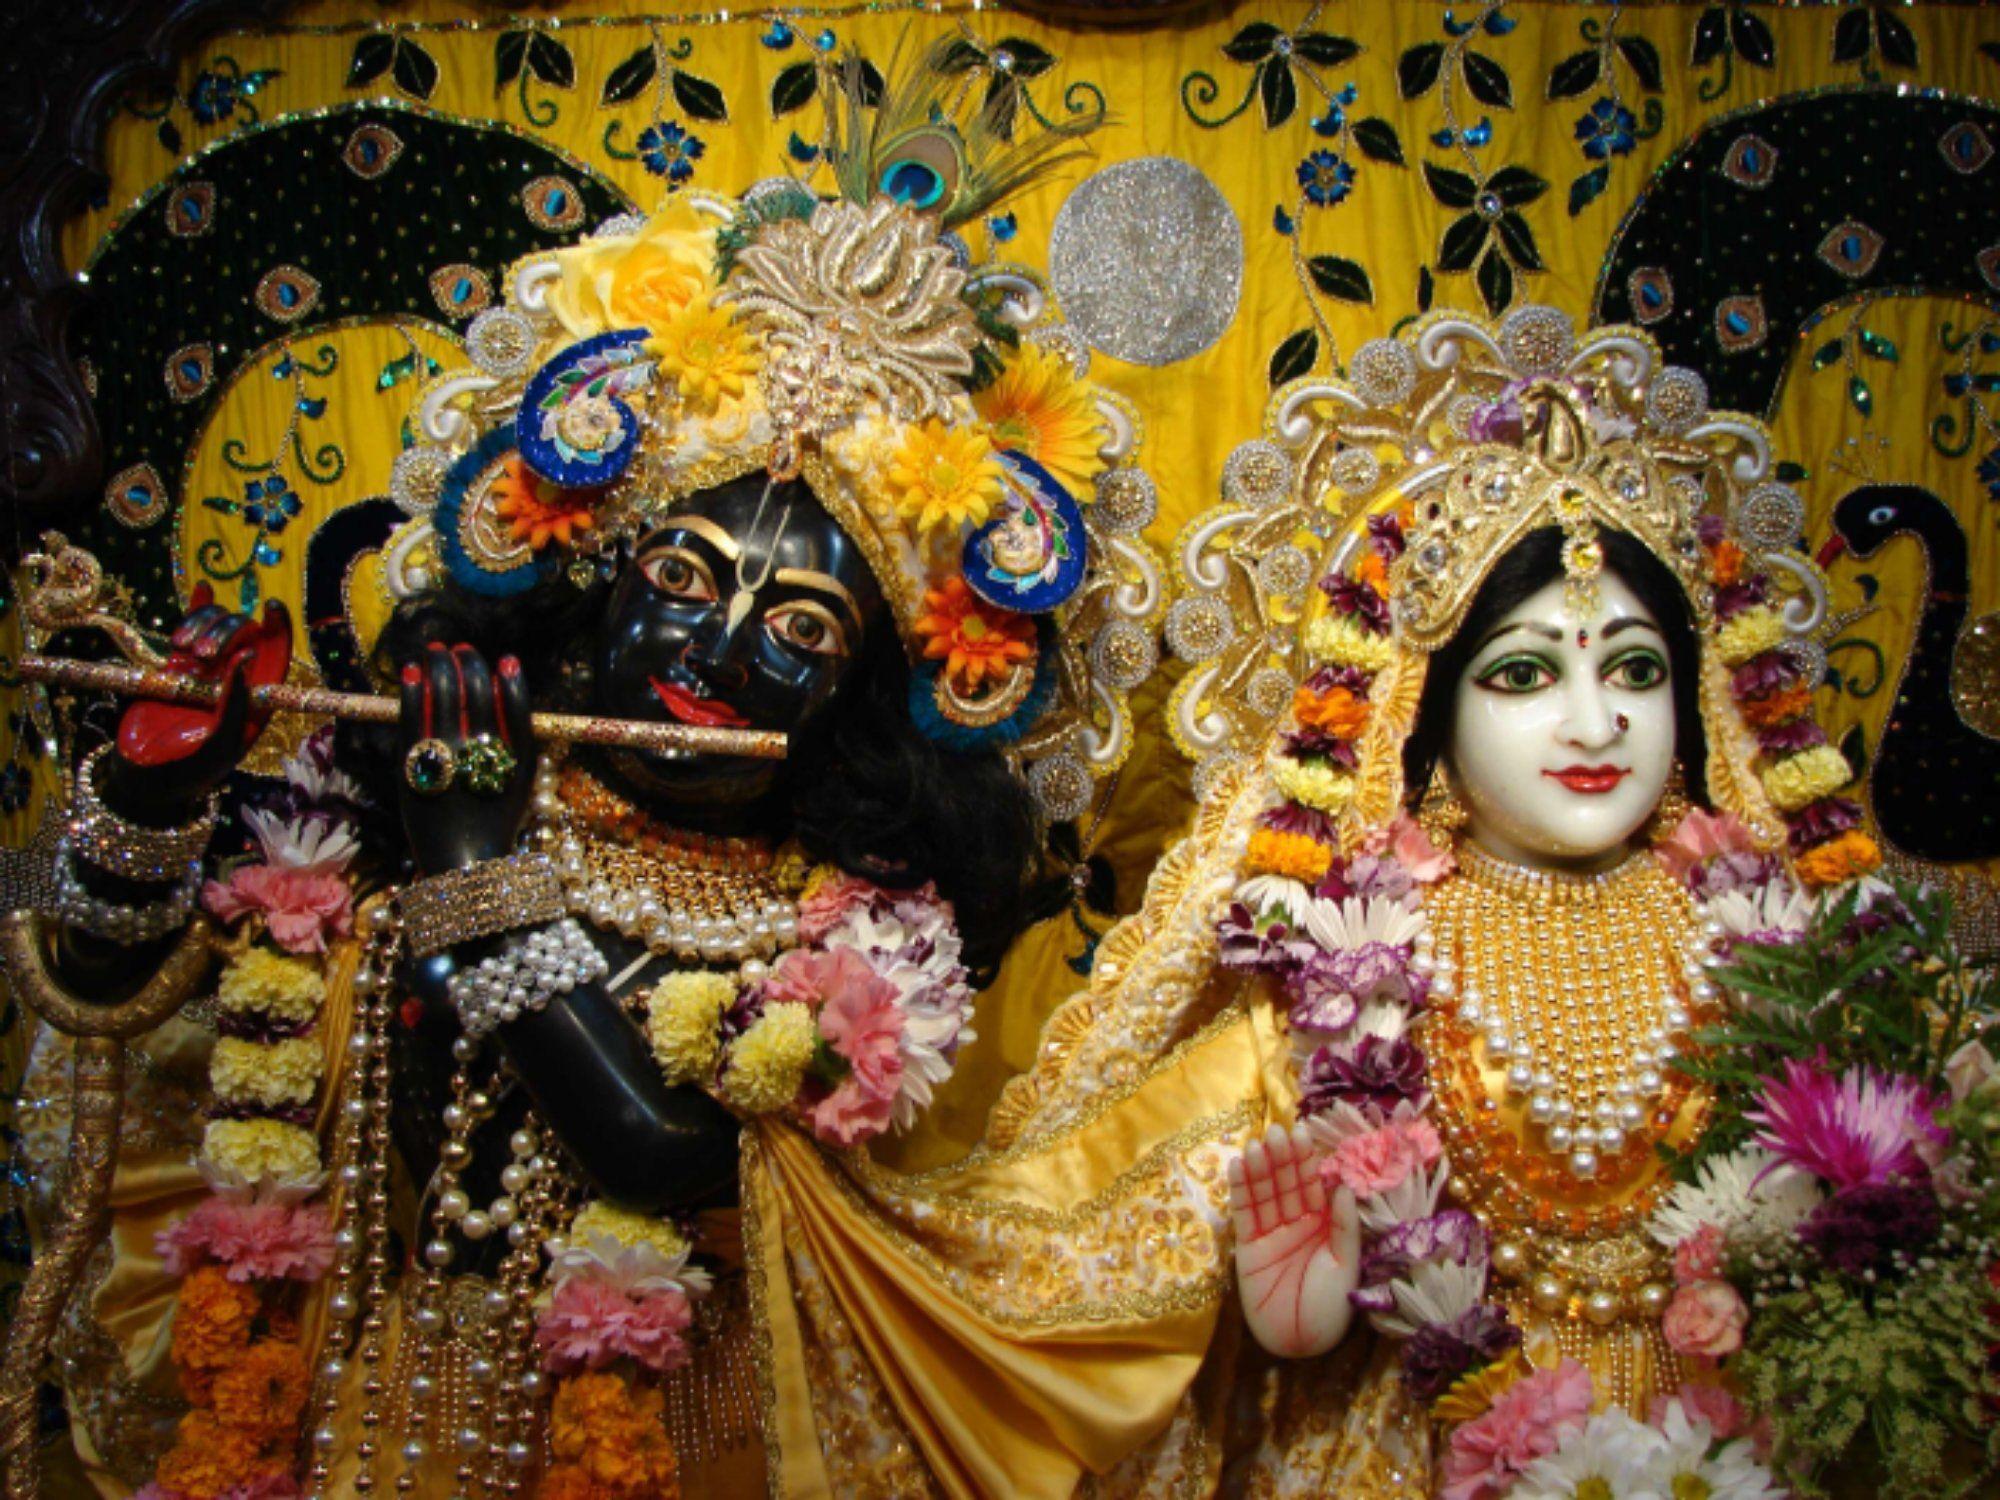 Radha Krishna Wallpapers Hd Full Size Wallpaper Cave